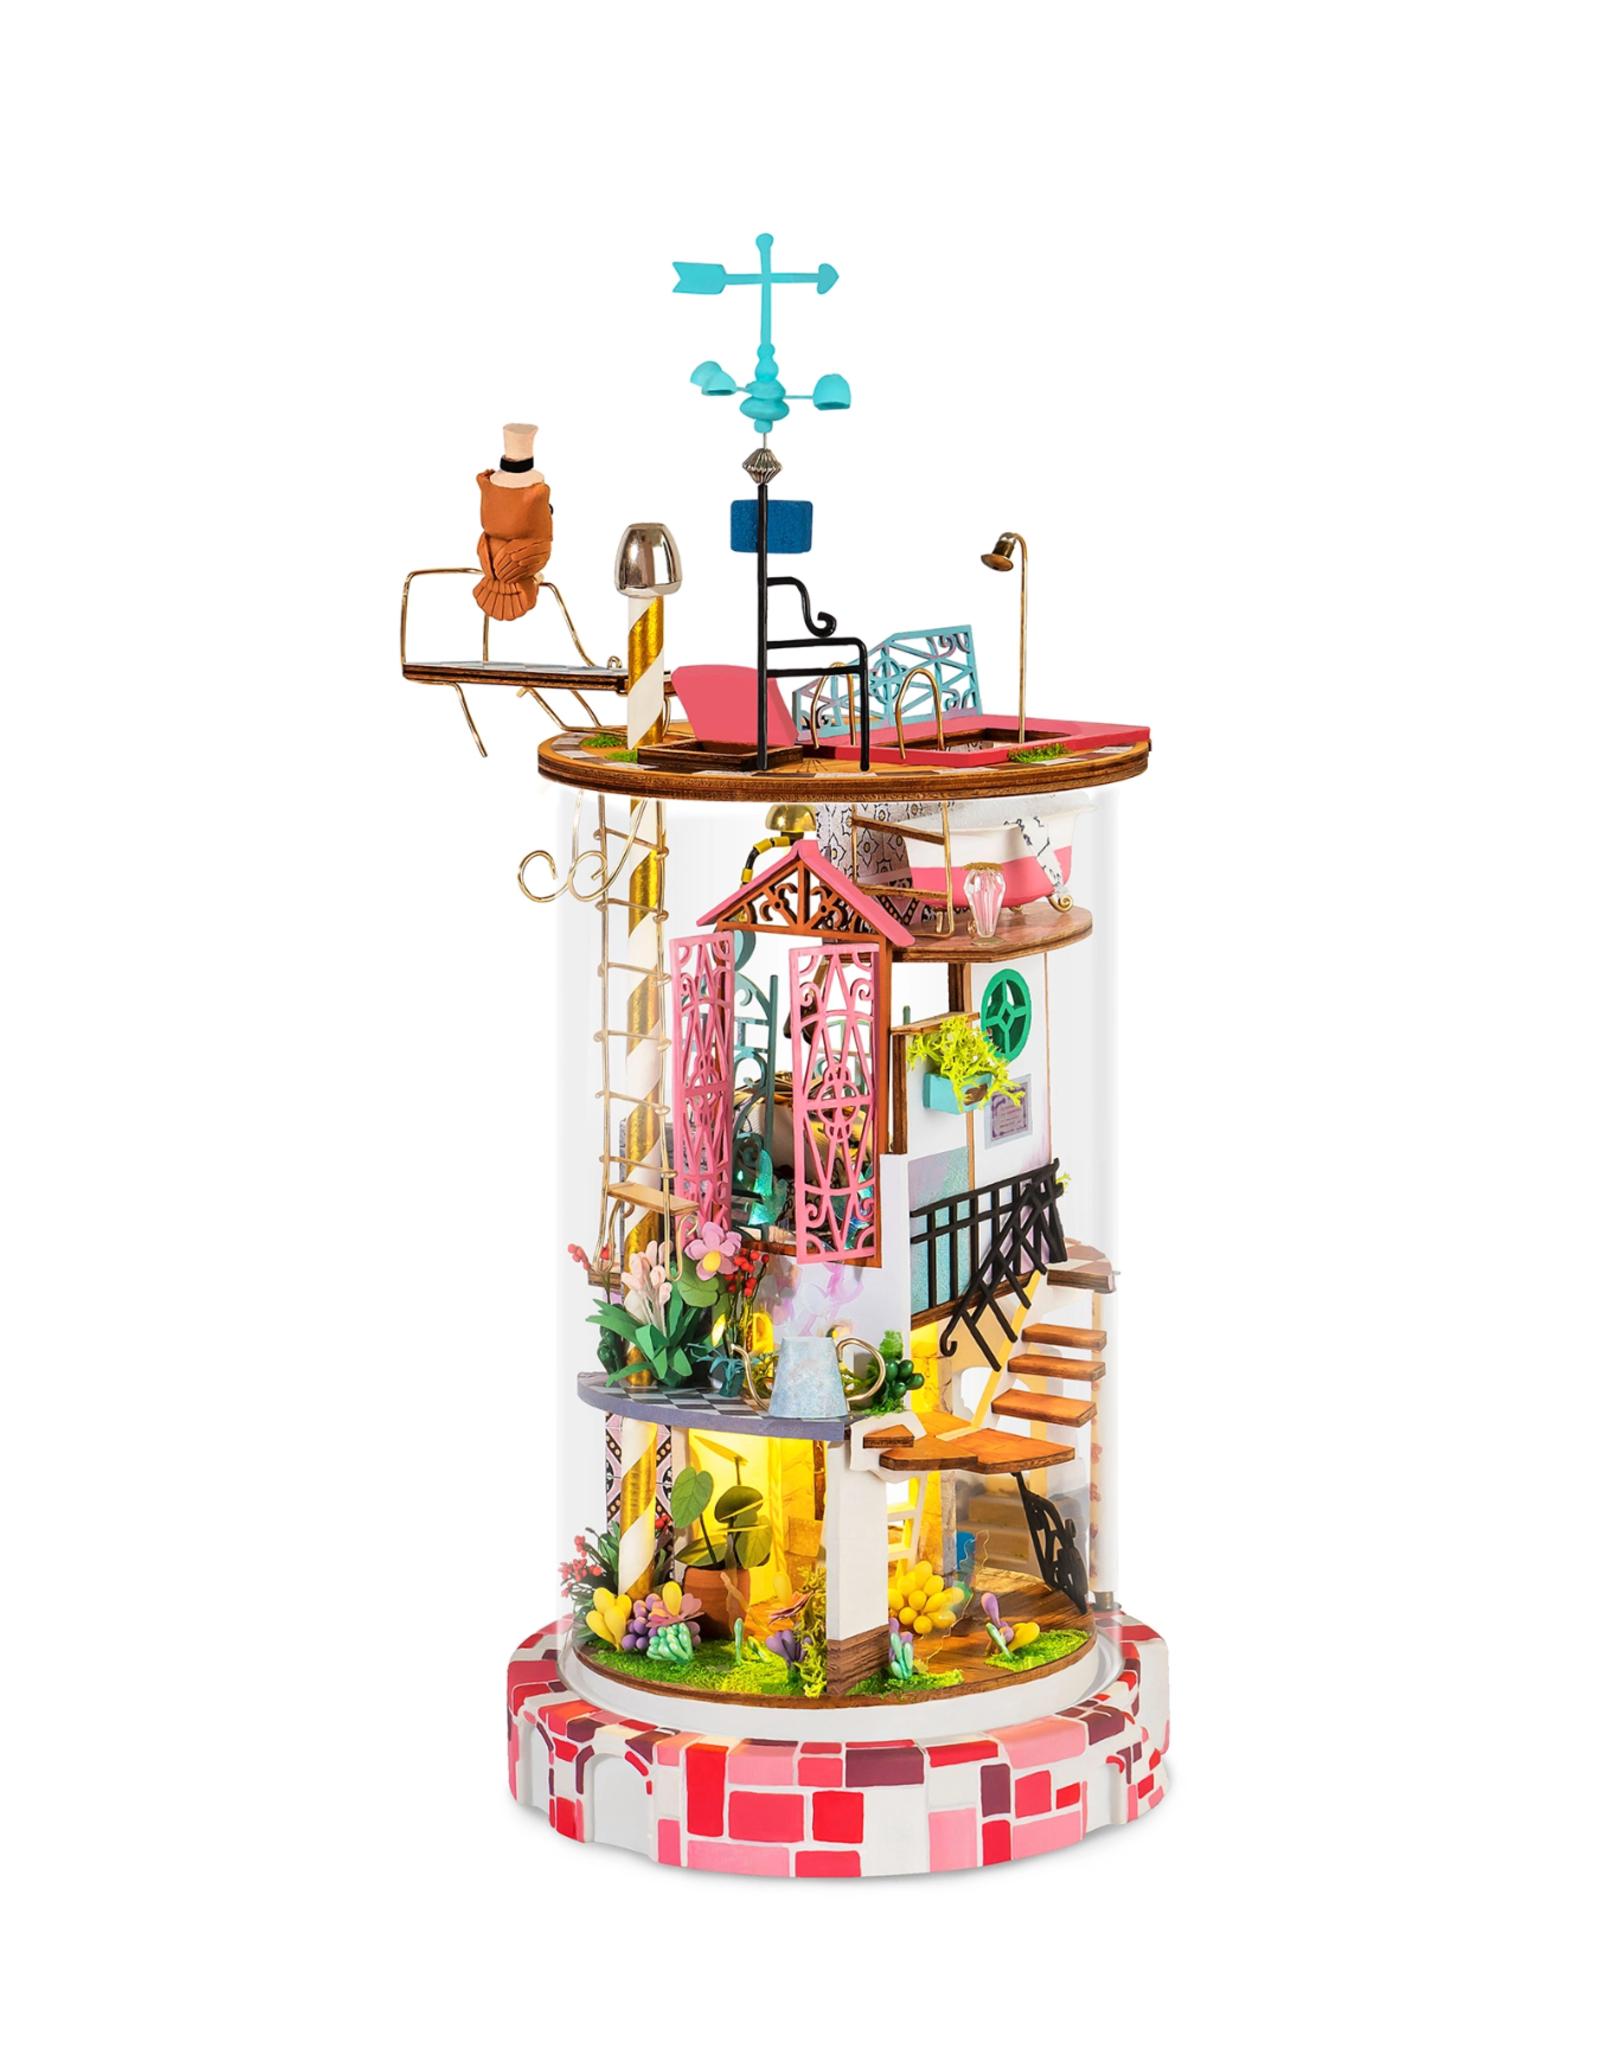 Hands Craft DIY Miniature House Kit : Bloomy House